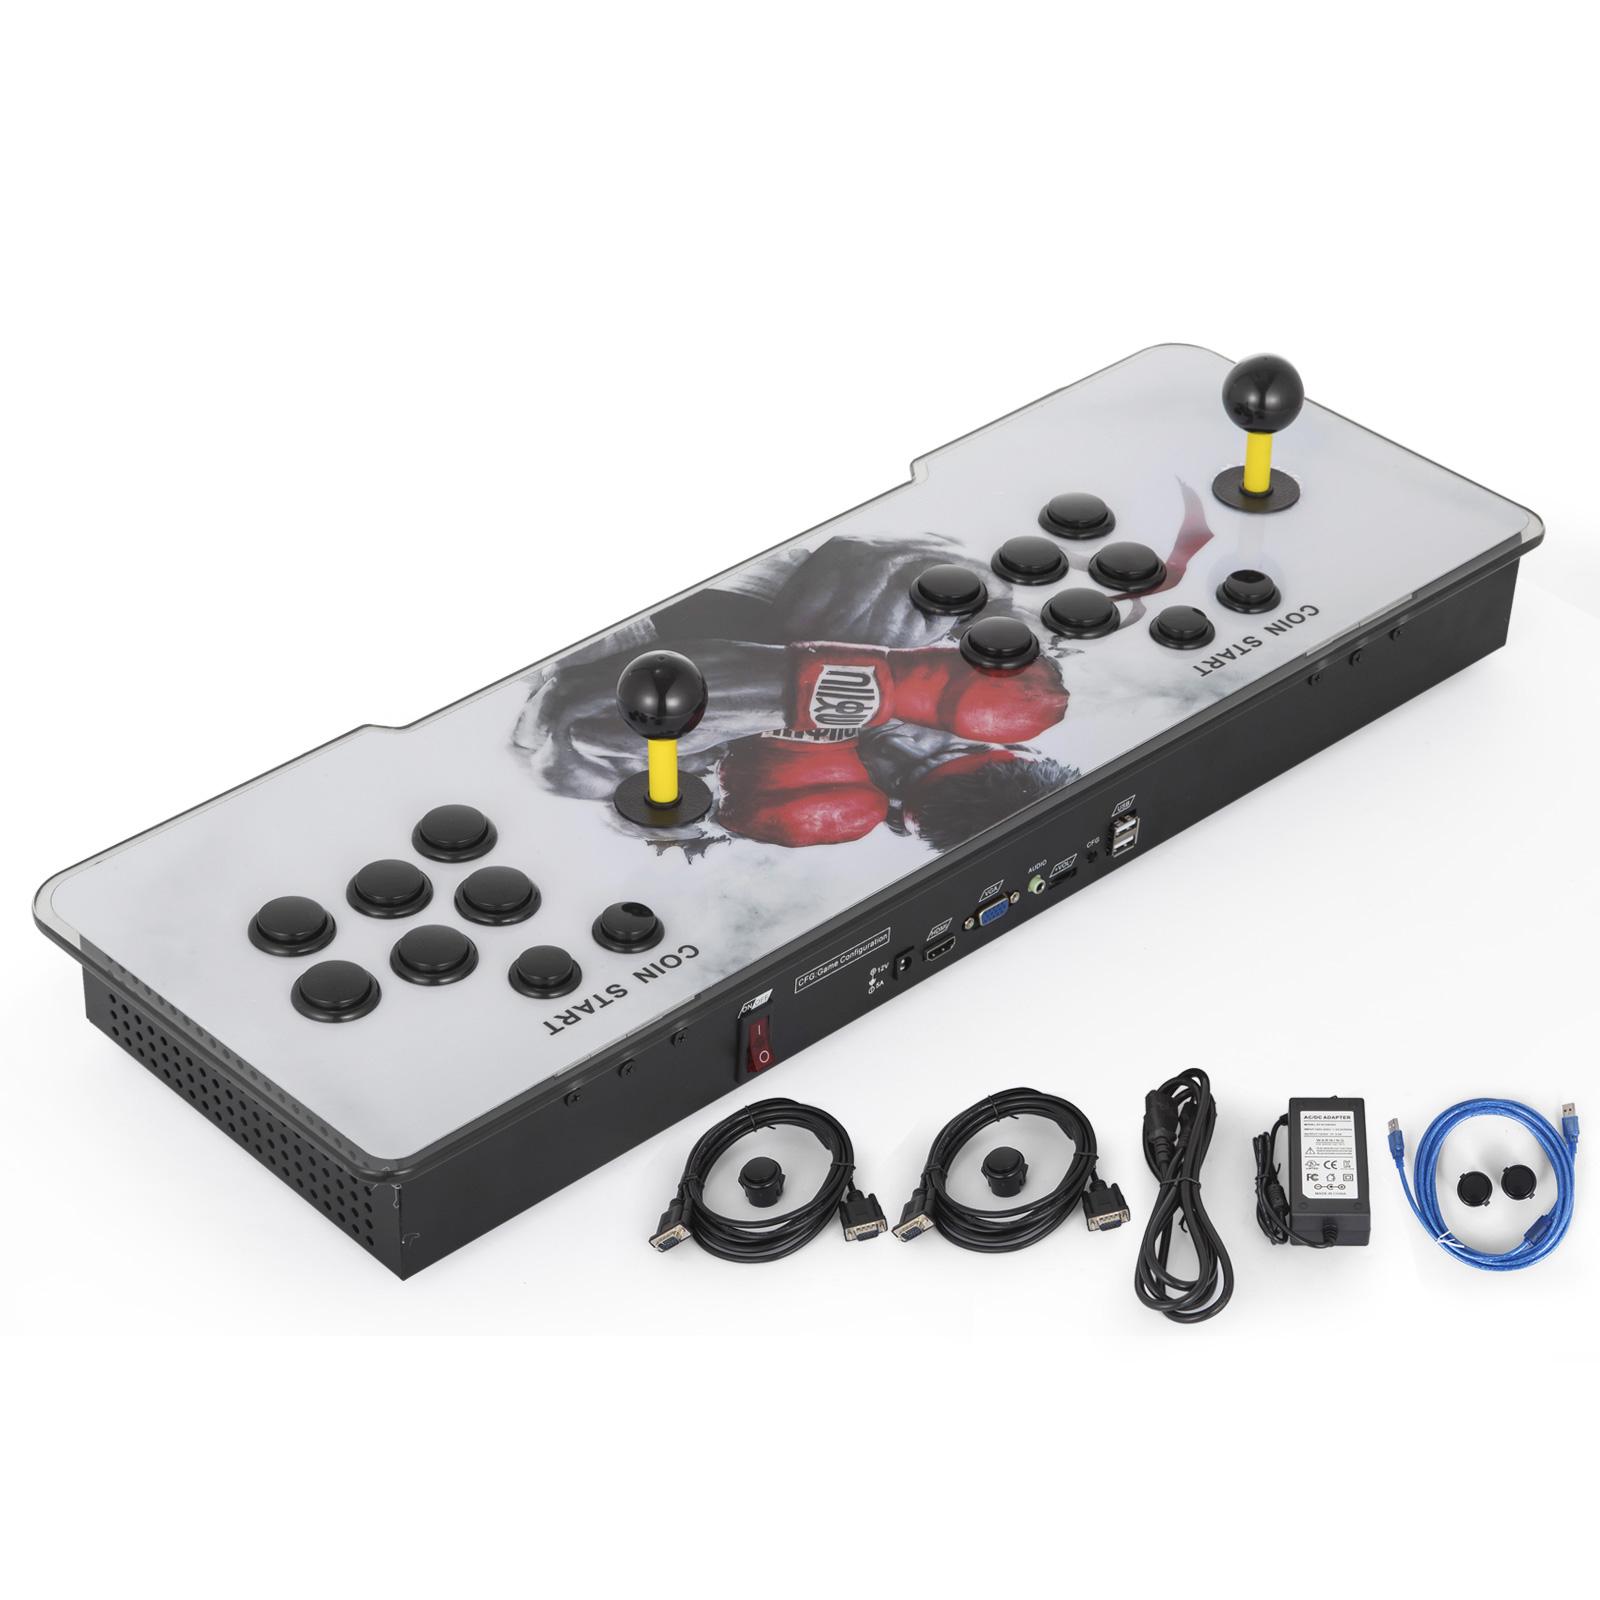 Details about 1500 Video Games Pandoras Box Key 9s Metal Double Stick  Arcade Console